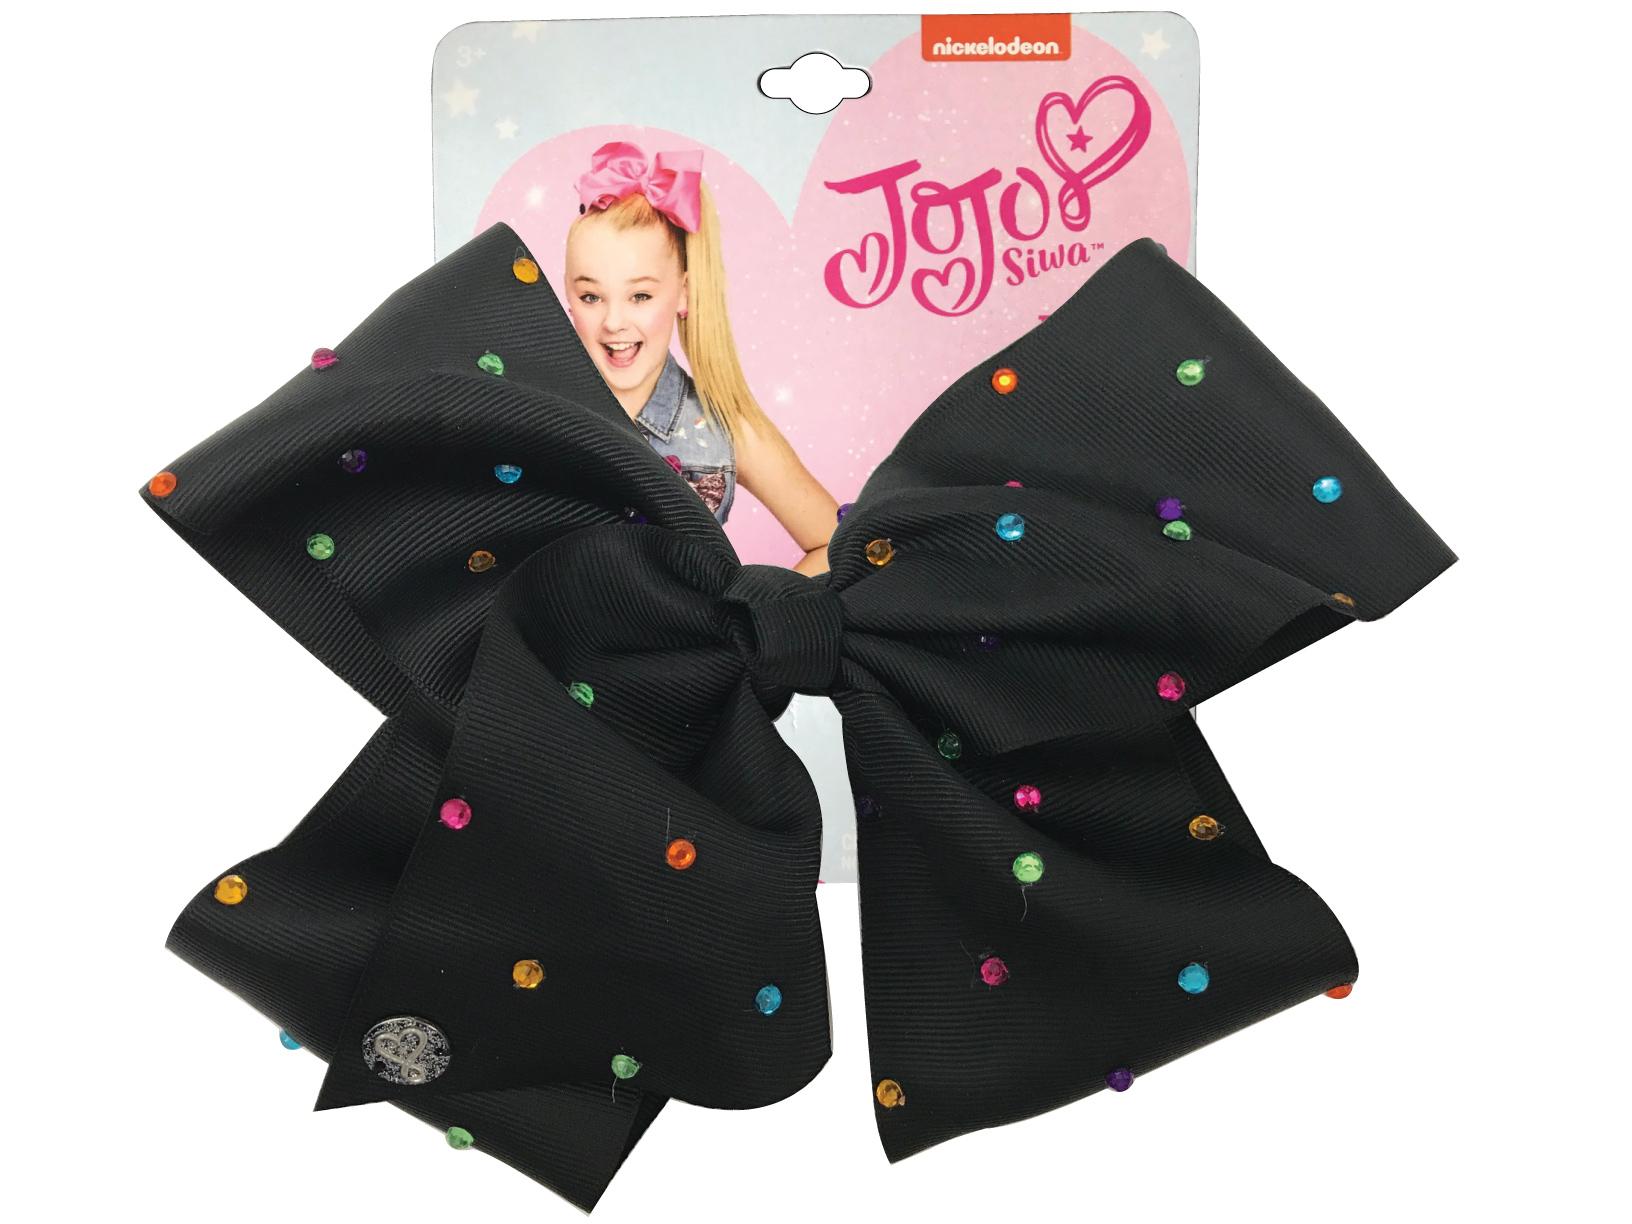 JoJo Siwa Large Cheer Hair Bow (Black w/Colored Rhinestones)